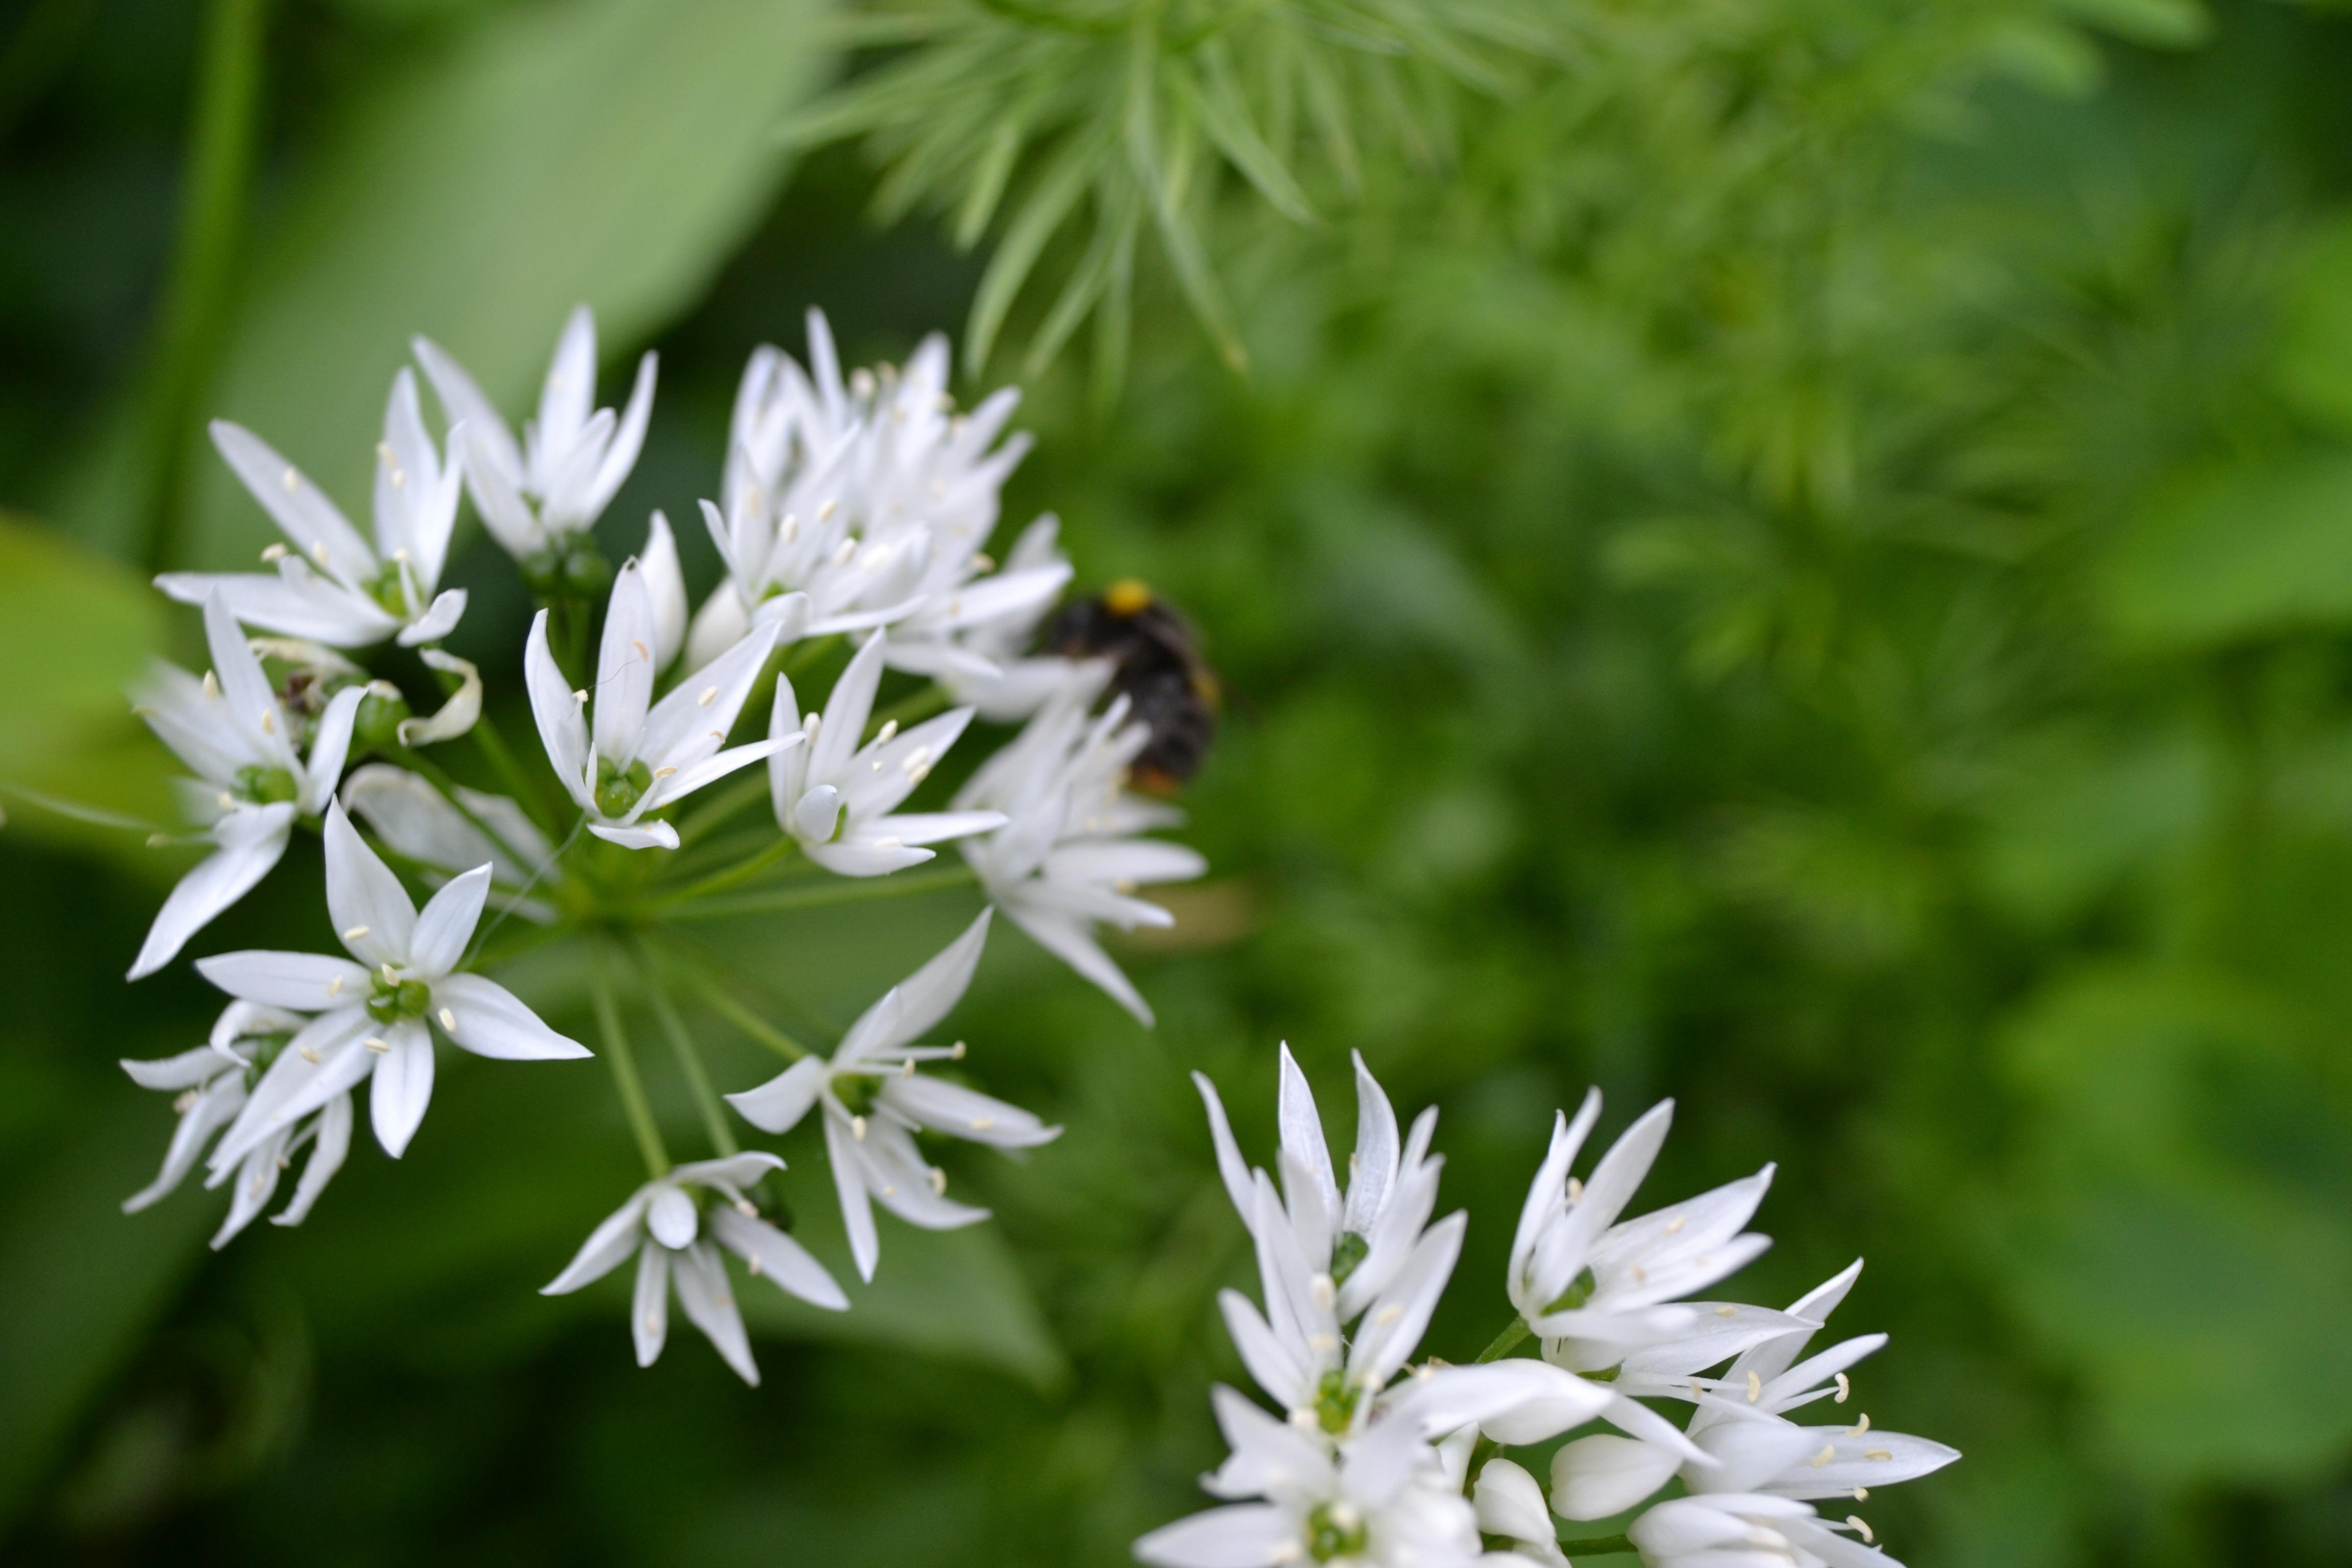 Images Gratuites La Nature Herbe Prairie Vert Botanique Flore